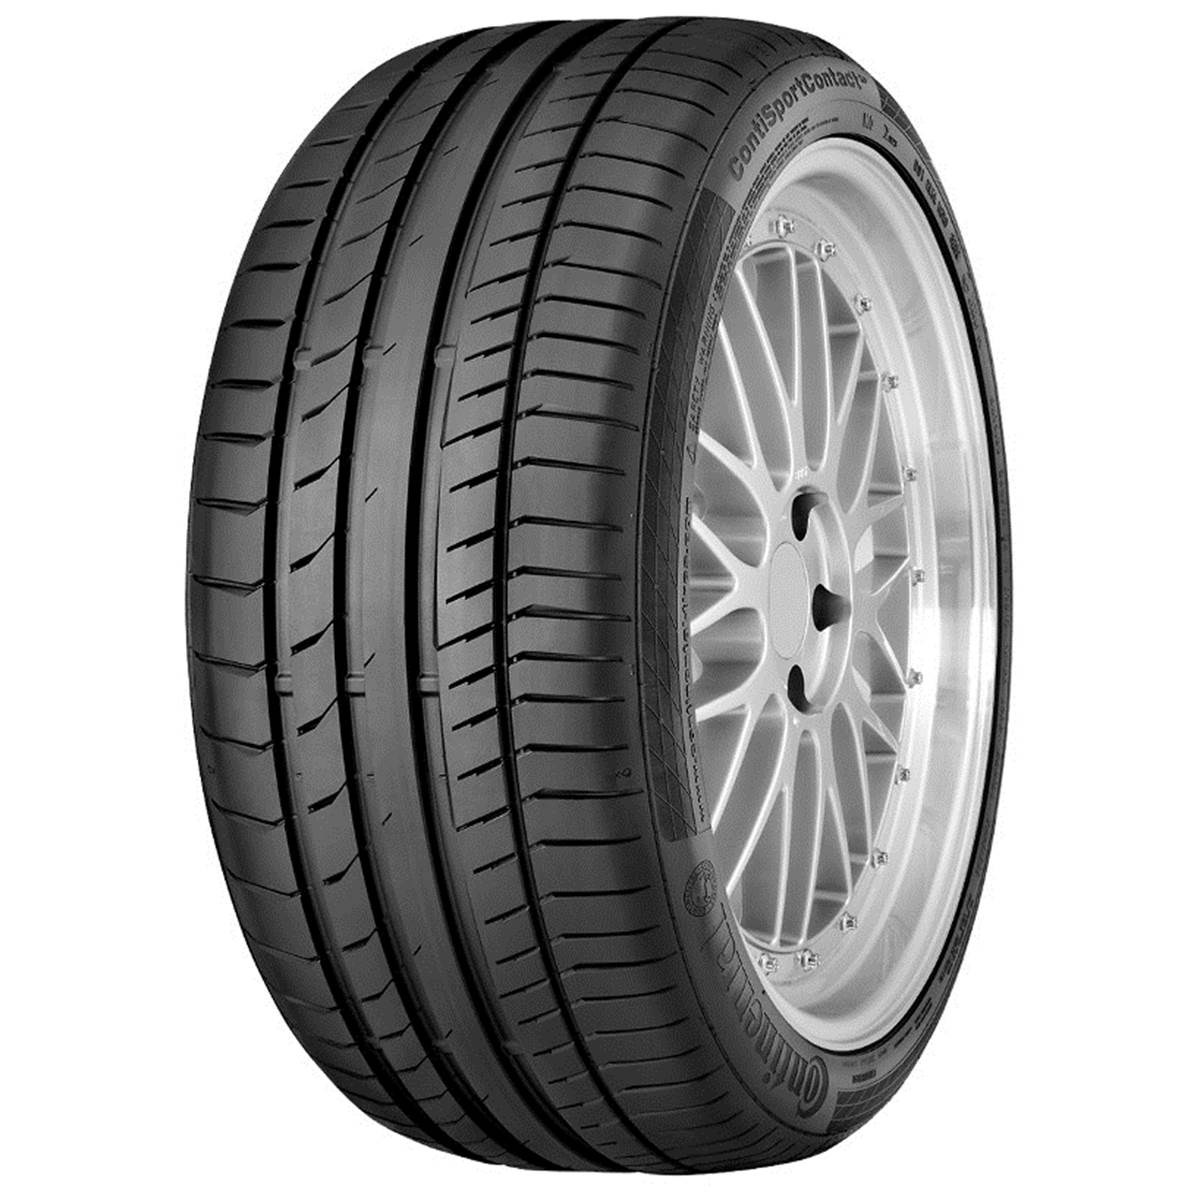 Pneu CONTINENTAL 255/40R21 102Y Contisportcontact 5P homologué Mercedes XL